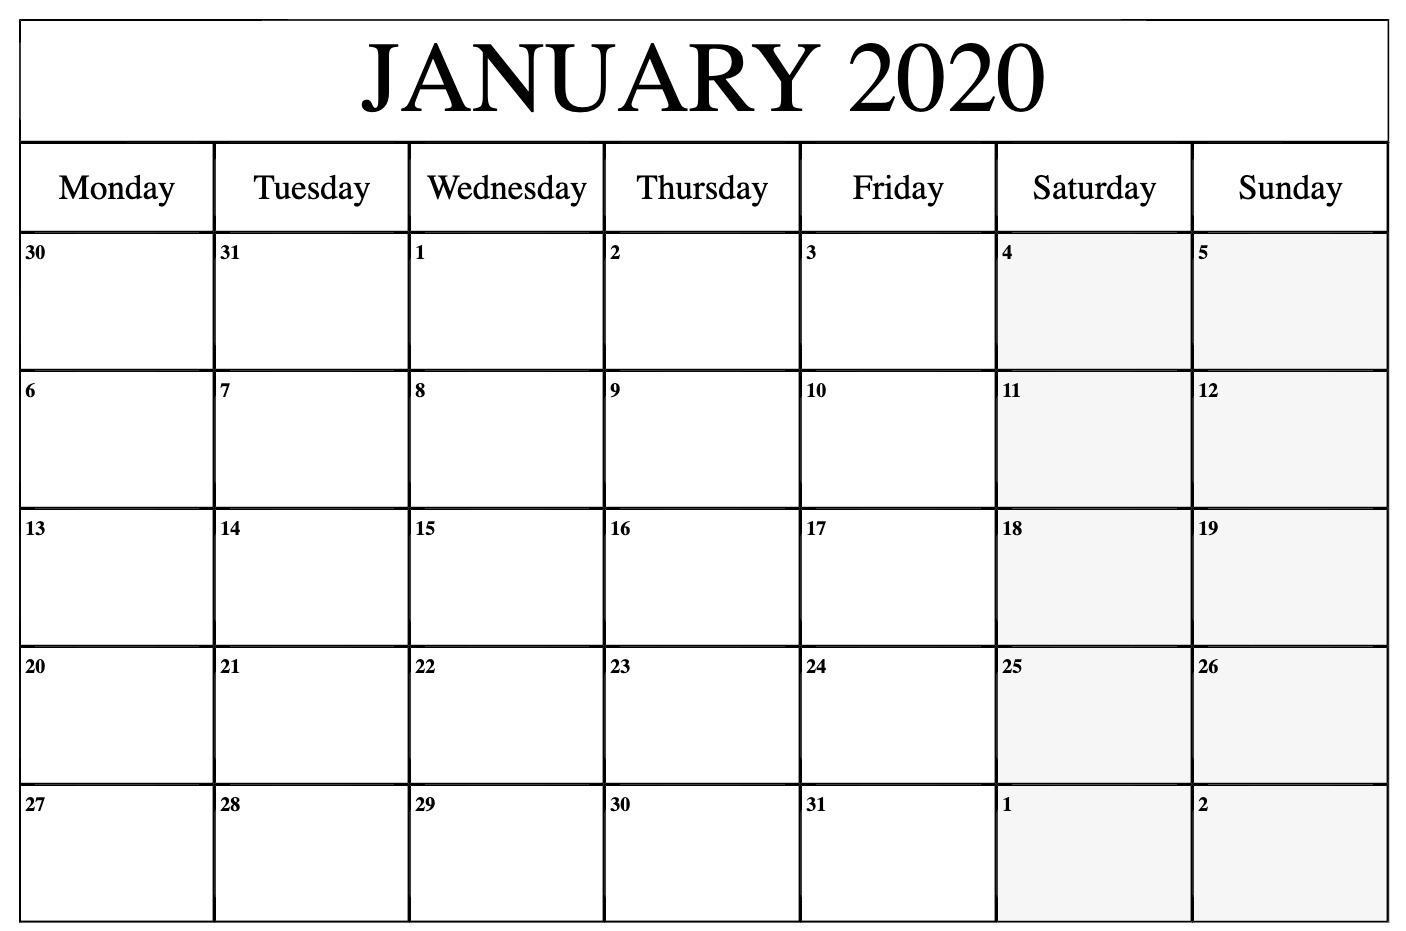 Blank January 2020 Calendar Template